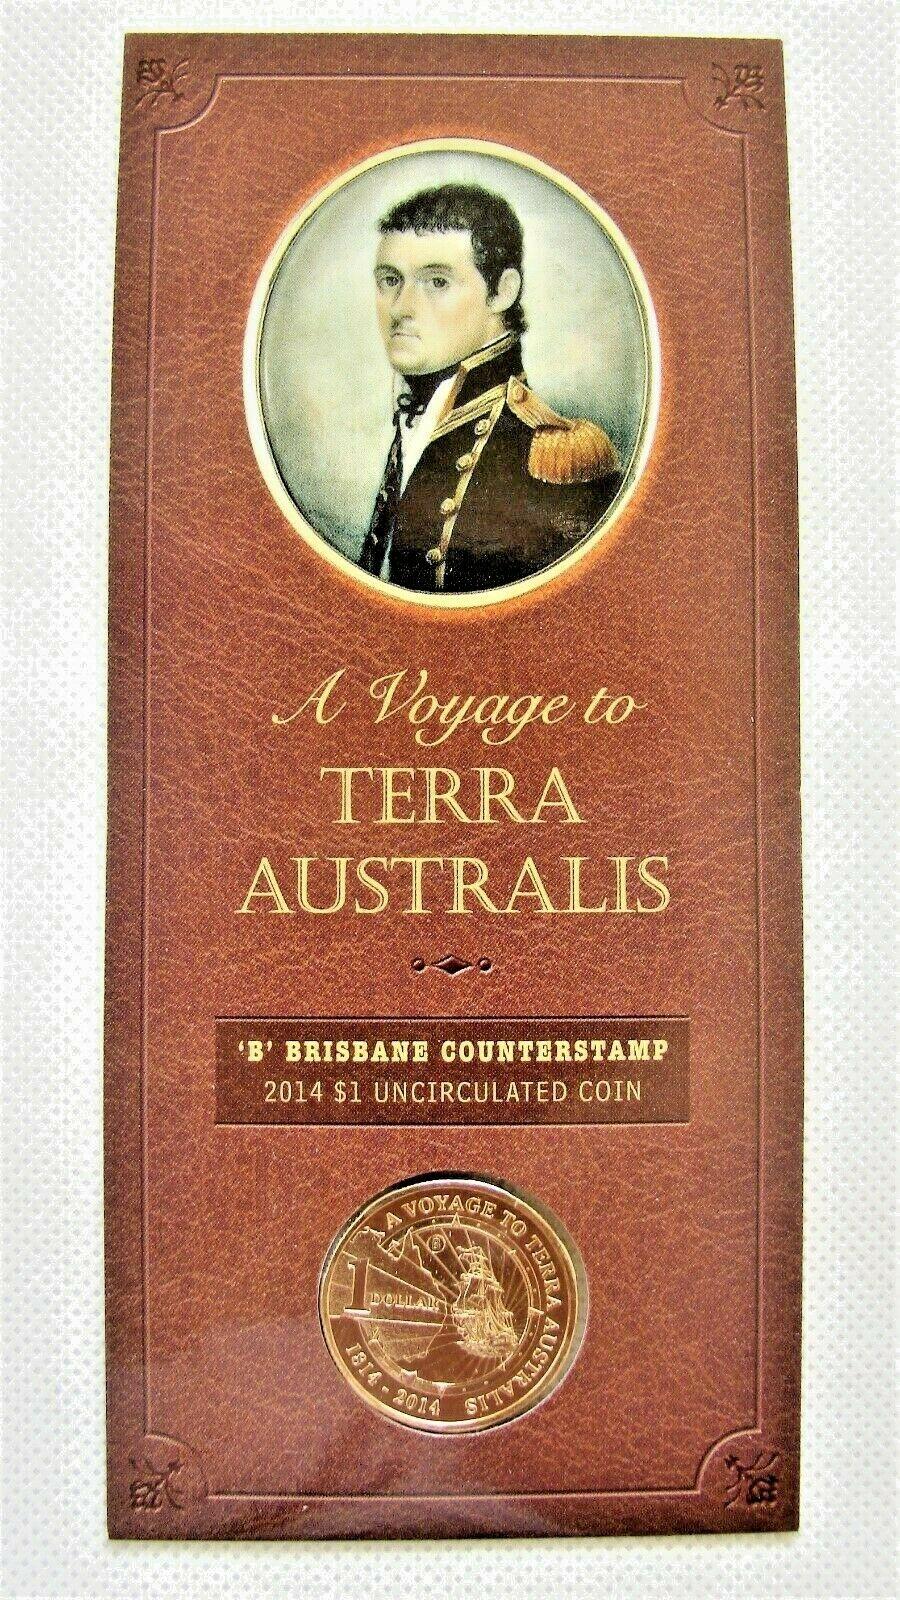 Thumbnail for 2014 Terra Australis Brisbane Counterstamp $1.00 on Card